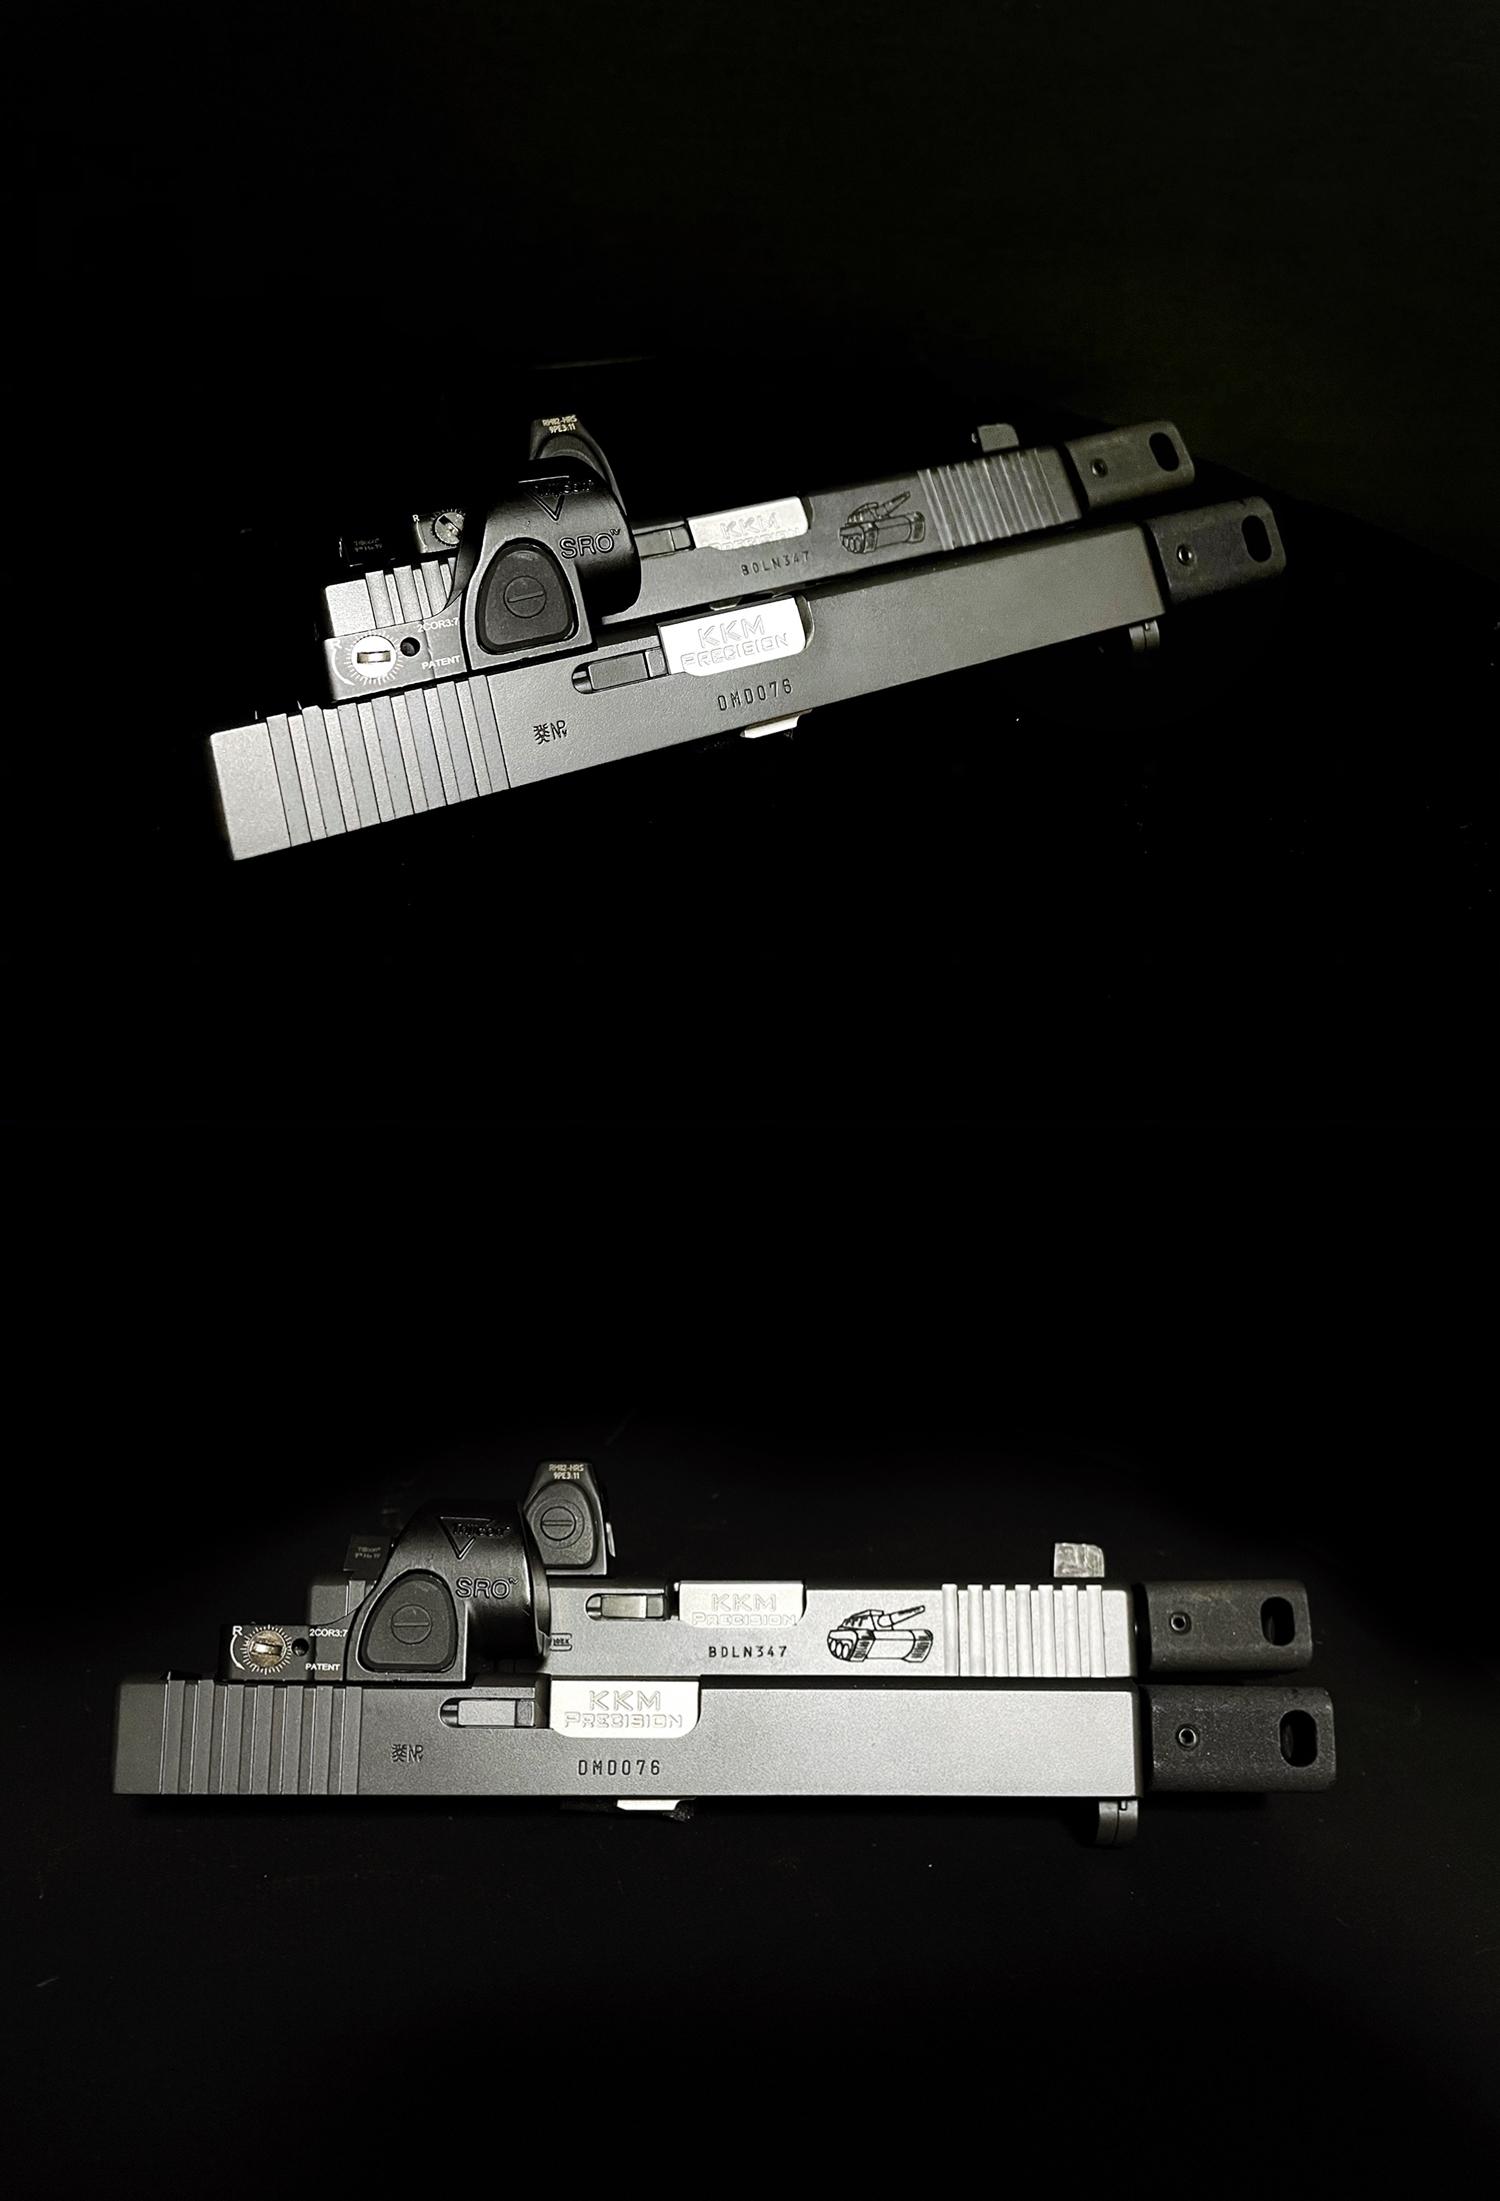 13 Guns Modify KKM PRECISION GLOCK ステンレスアウターバレル 東京マルイ G17 G18C GBB GET! リアルで重量感あるCNC 精密切り出し加工! BARREL+PROTECTOR+ショートリコイルアシストスプリング+インナーバレルセッ